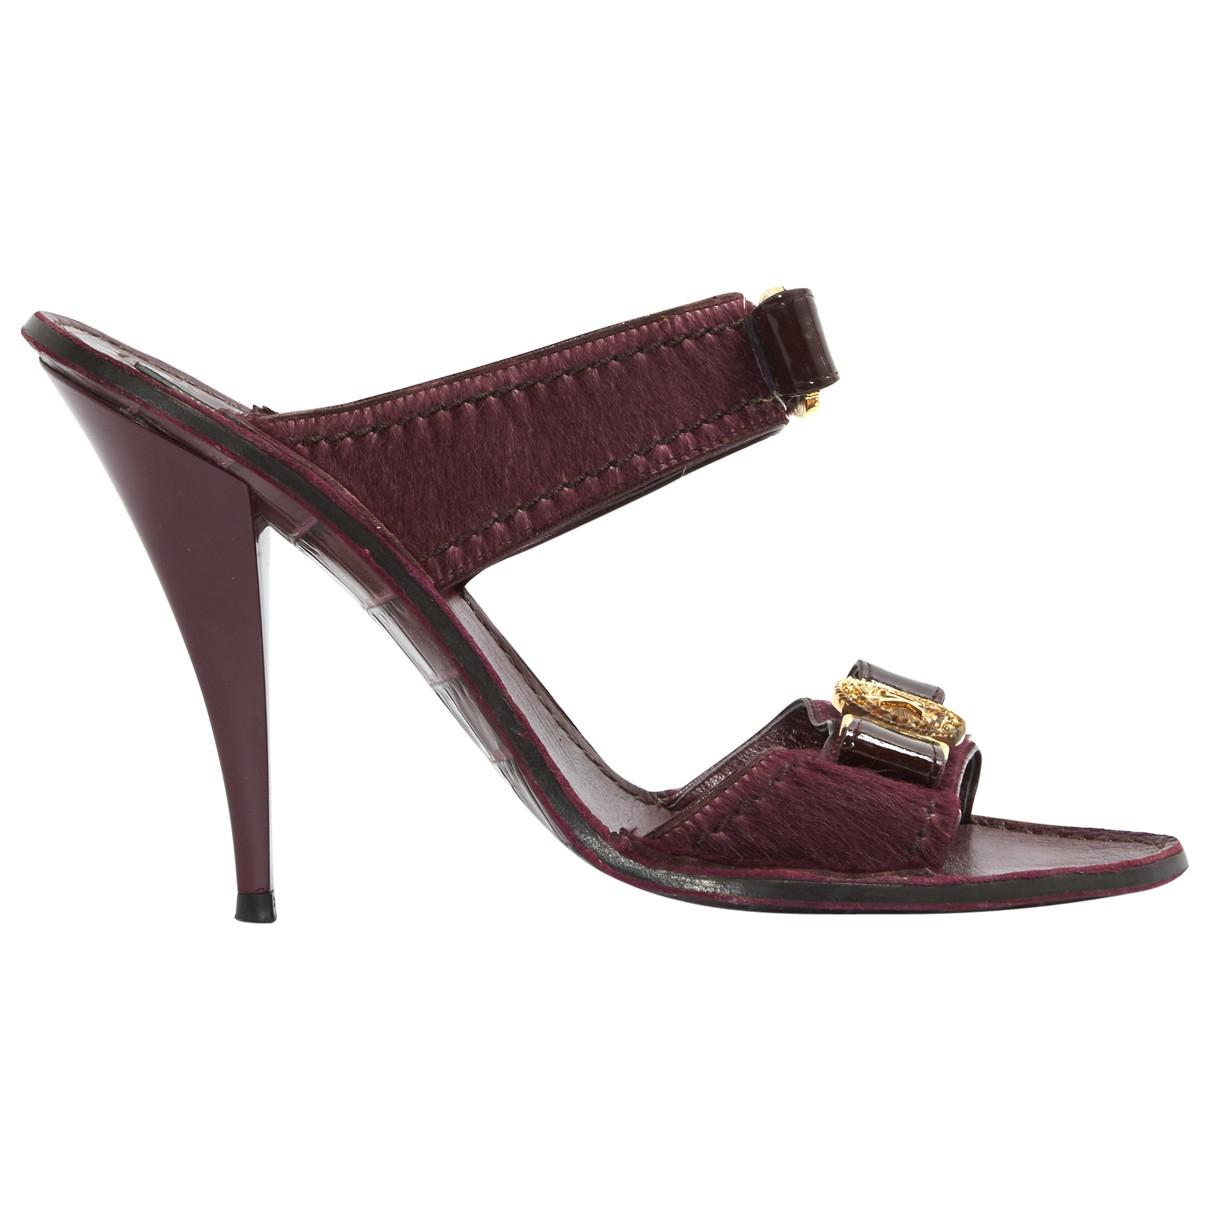 Pre-owned - Pony-style calfskin heels Marc Jacobs ipdWYFE